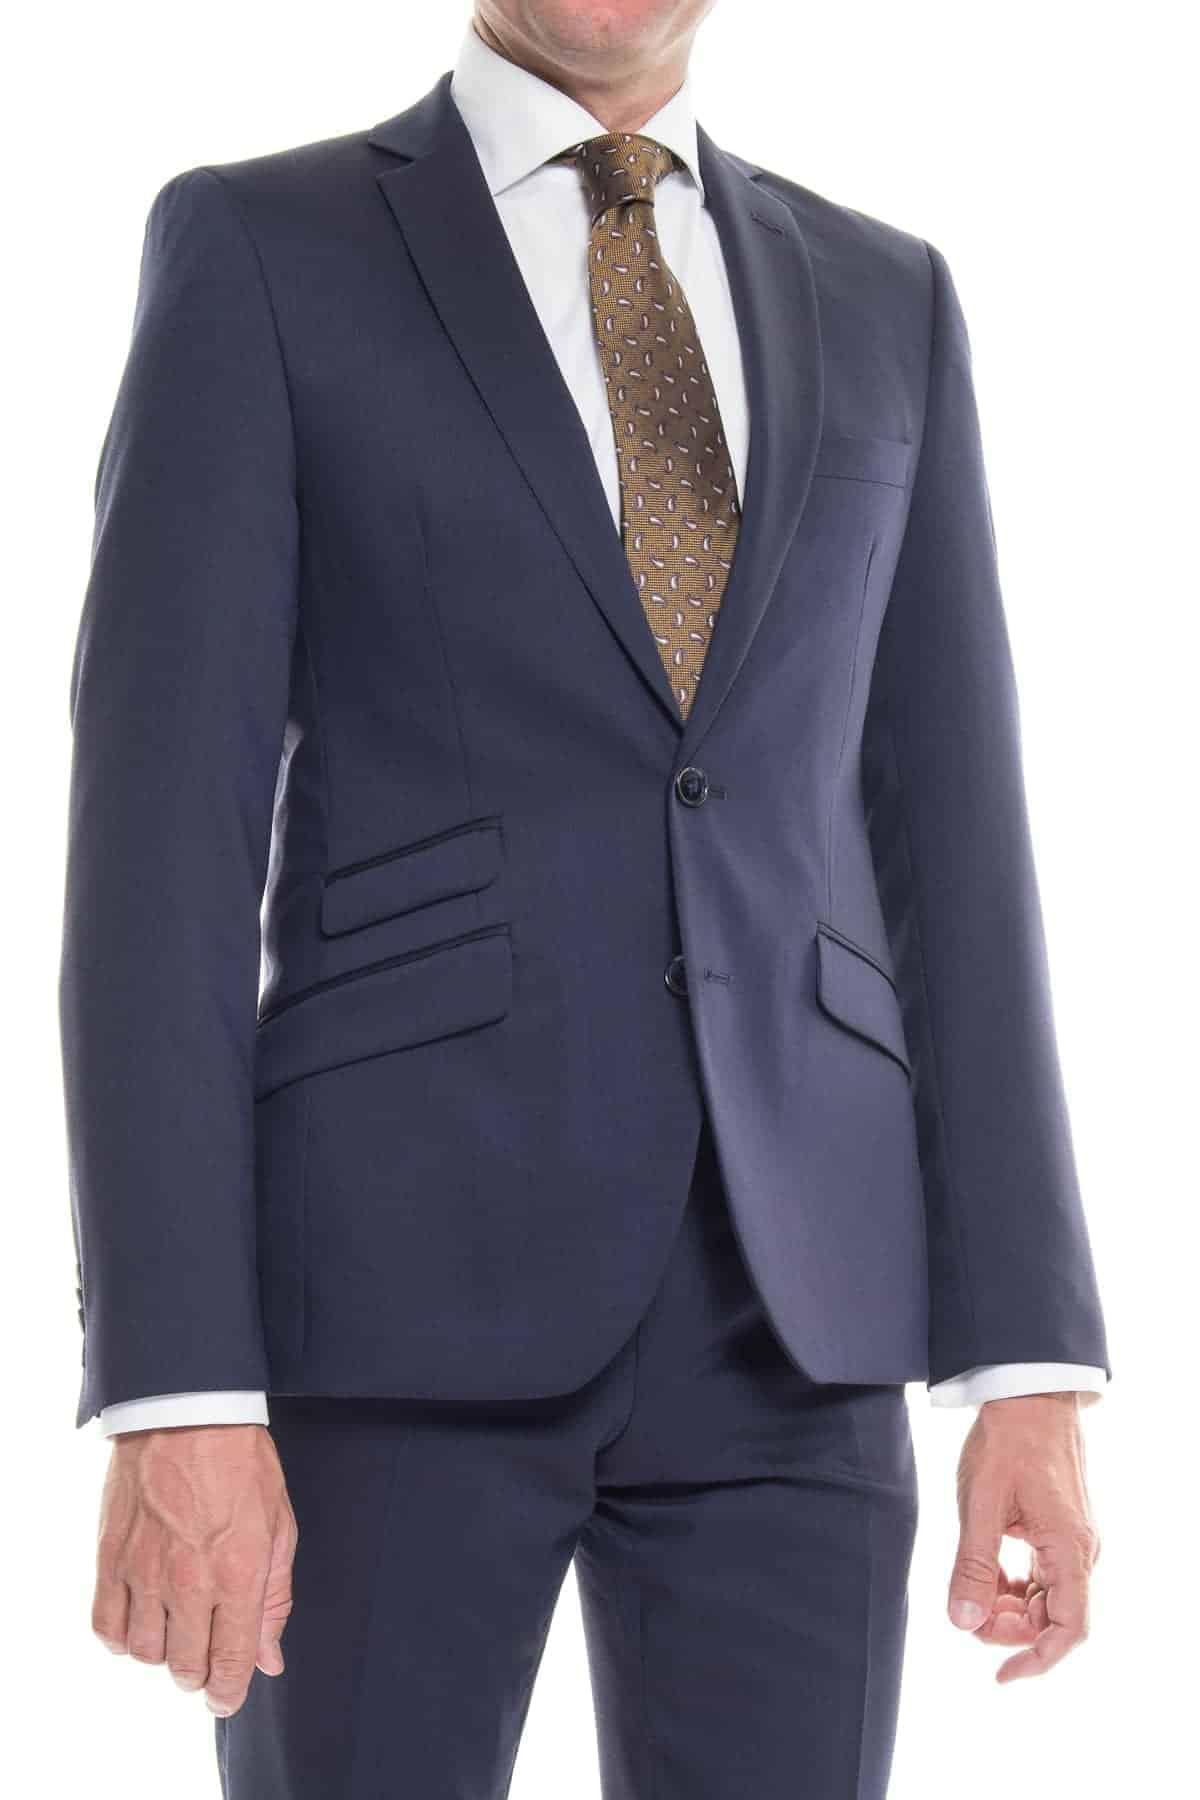 new product ec190 1f62f Anzug Silver blau strukturiert, Extra-Slim-Fit, Schurwoll-Mix,  Baukasten-Anzug, topmoderner Business-Anzug, Made in Europe